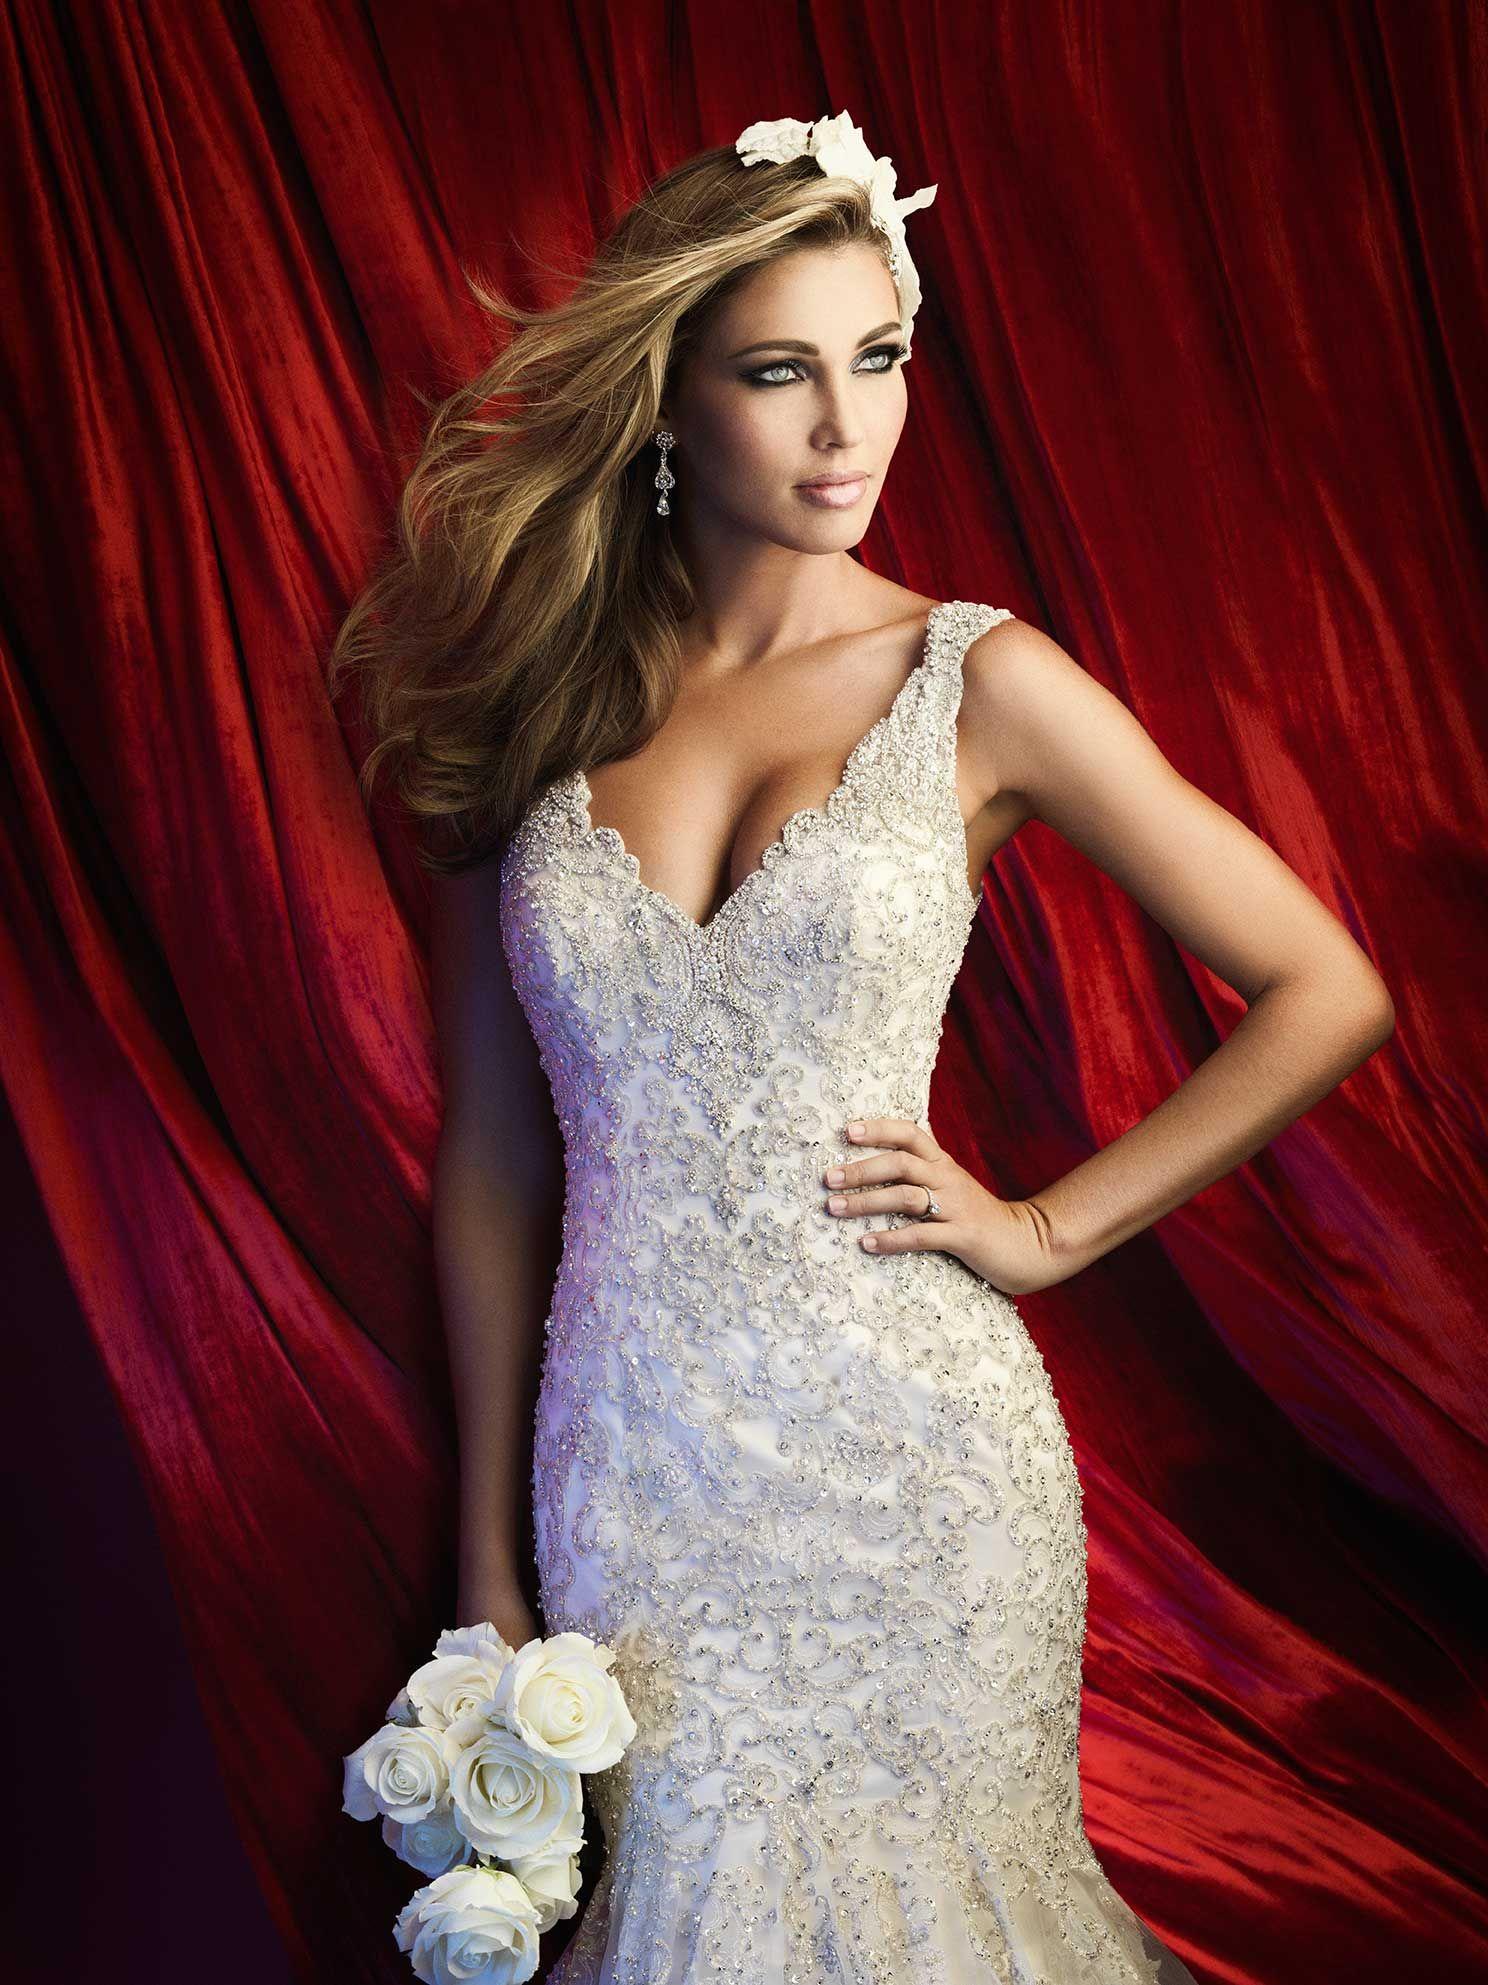 View the allure couture collection at bella sera bridal view the allure couture collection at bella sera bridal occasion junglespirit Gallery